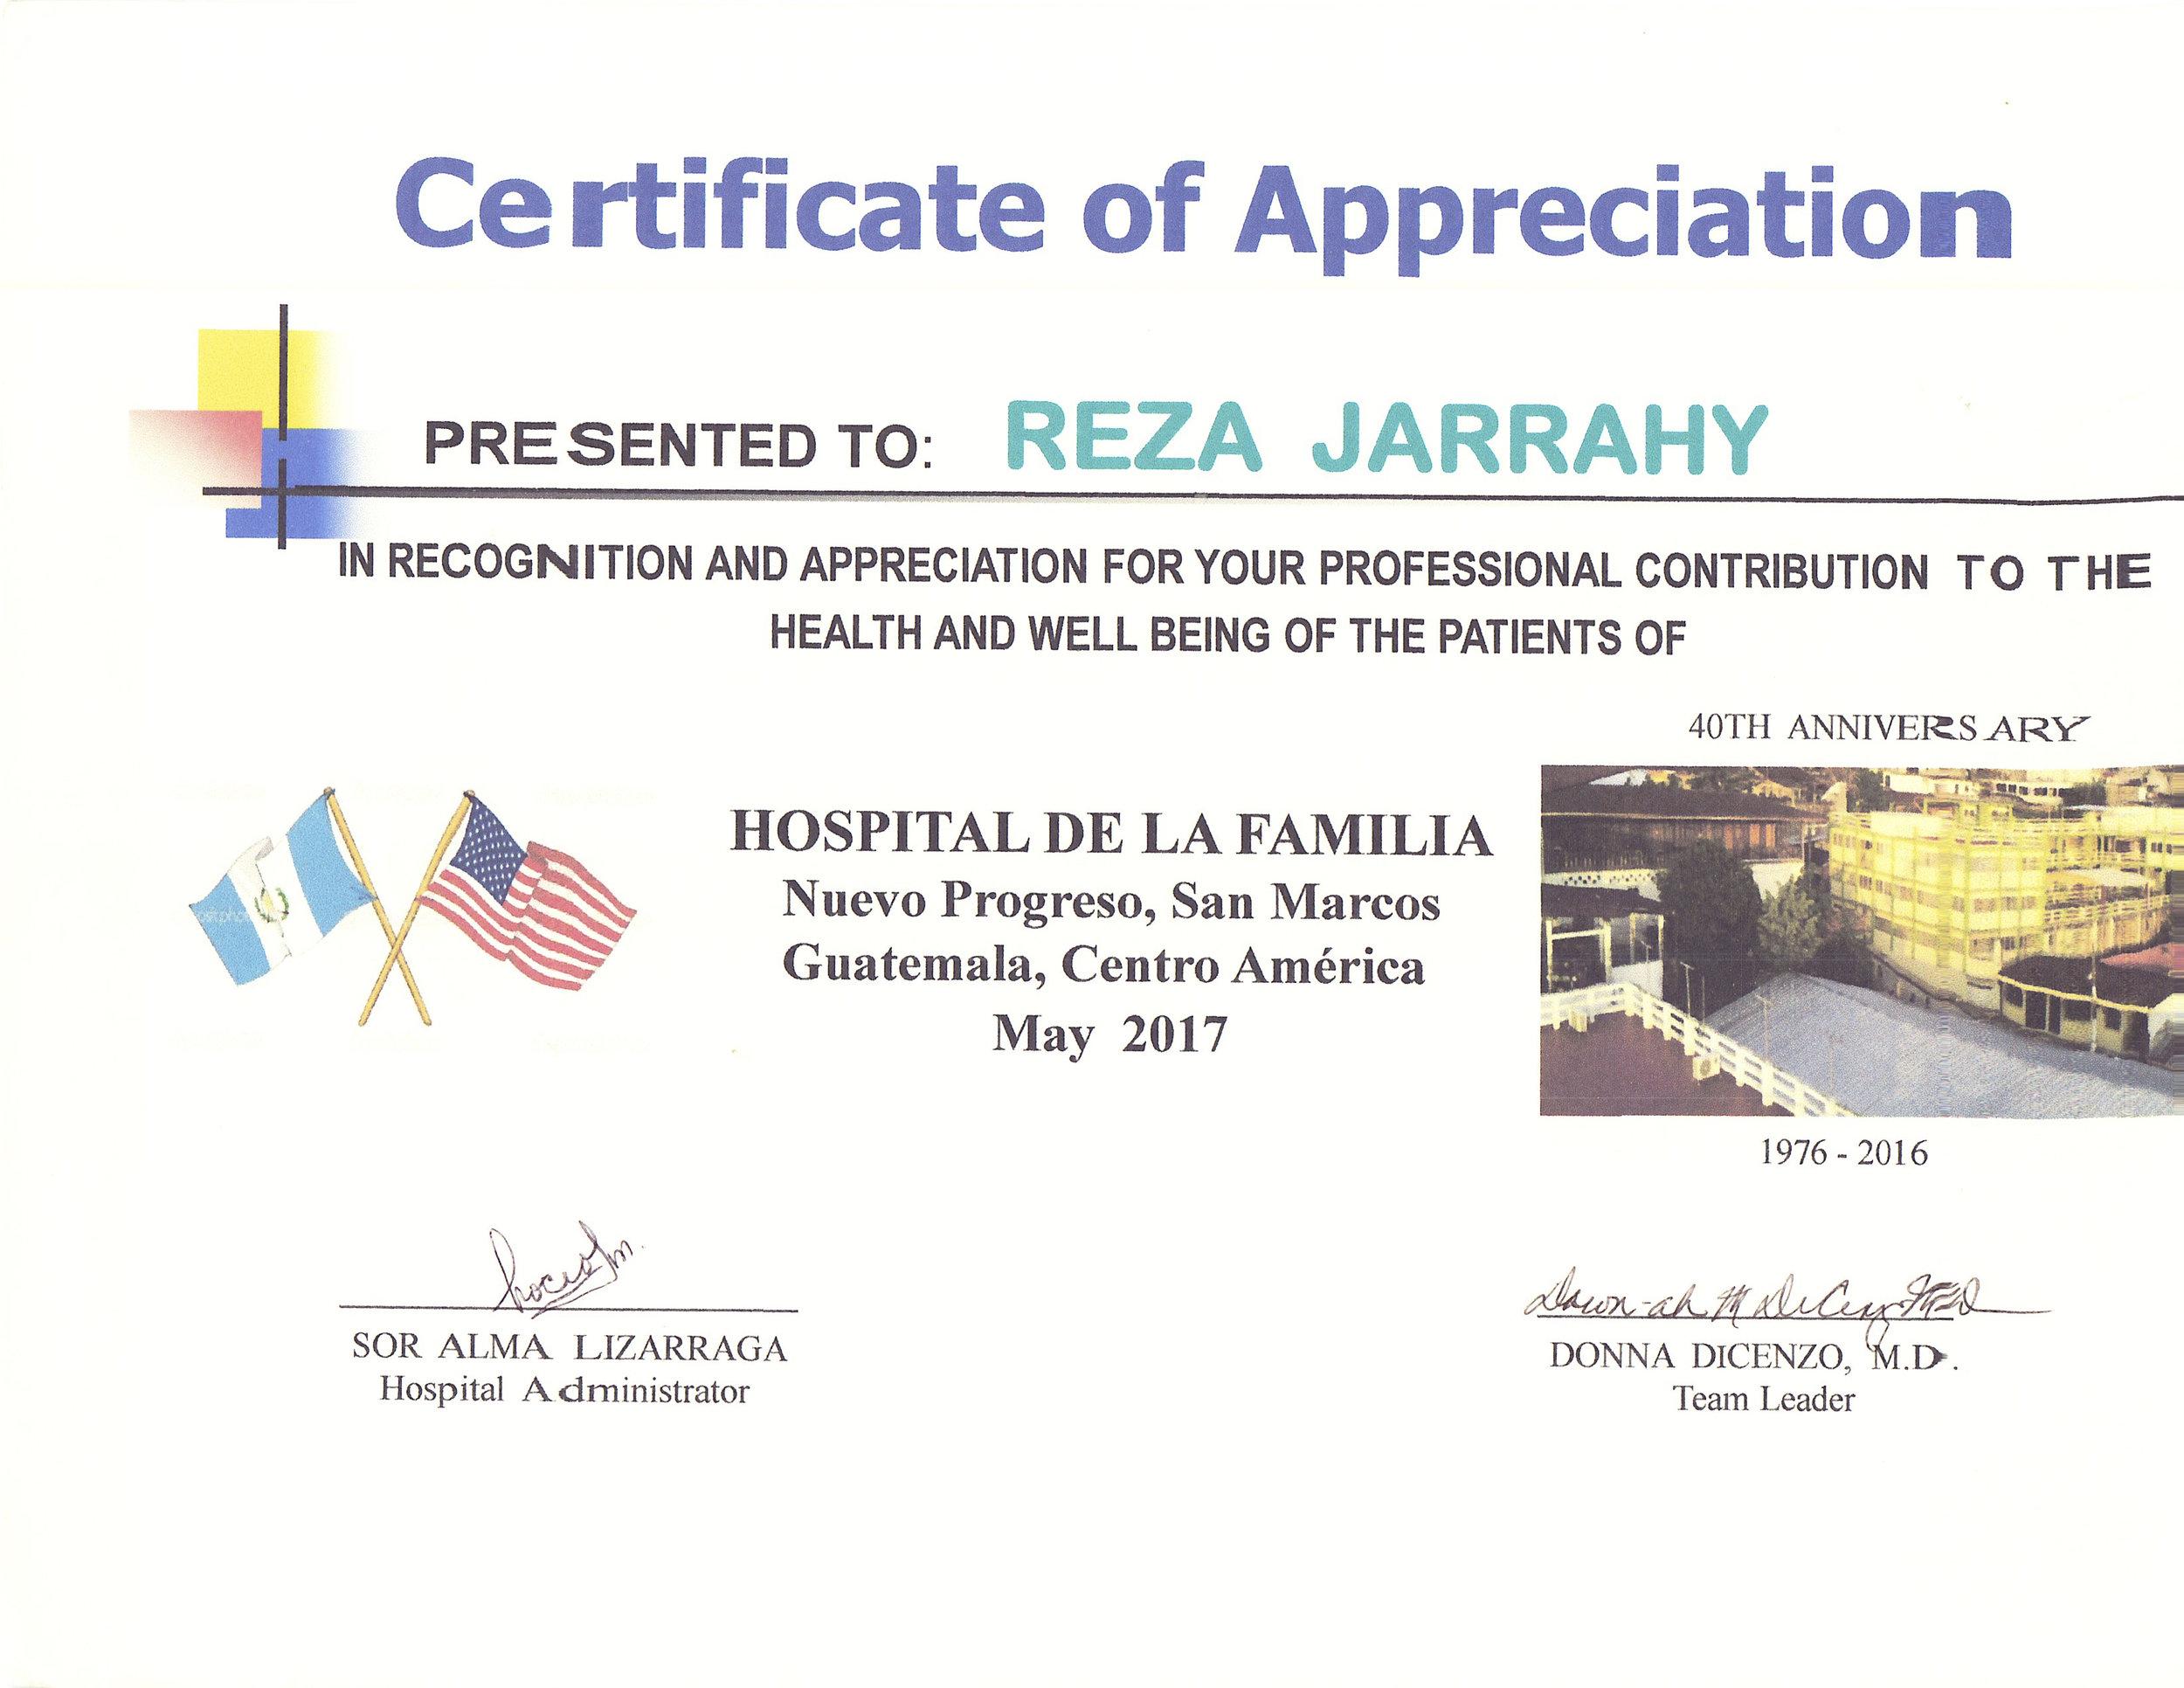 hdlf certificate may 2017.jpg